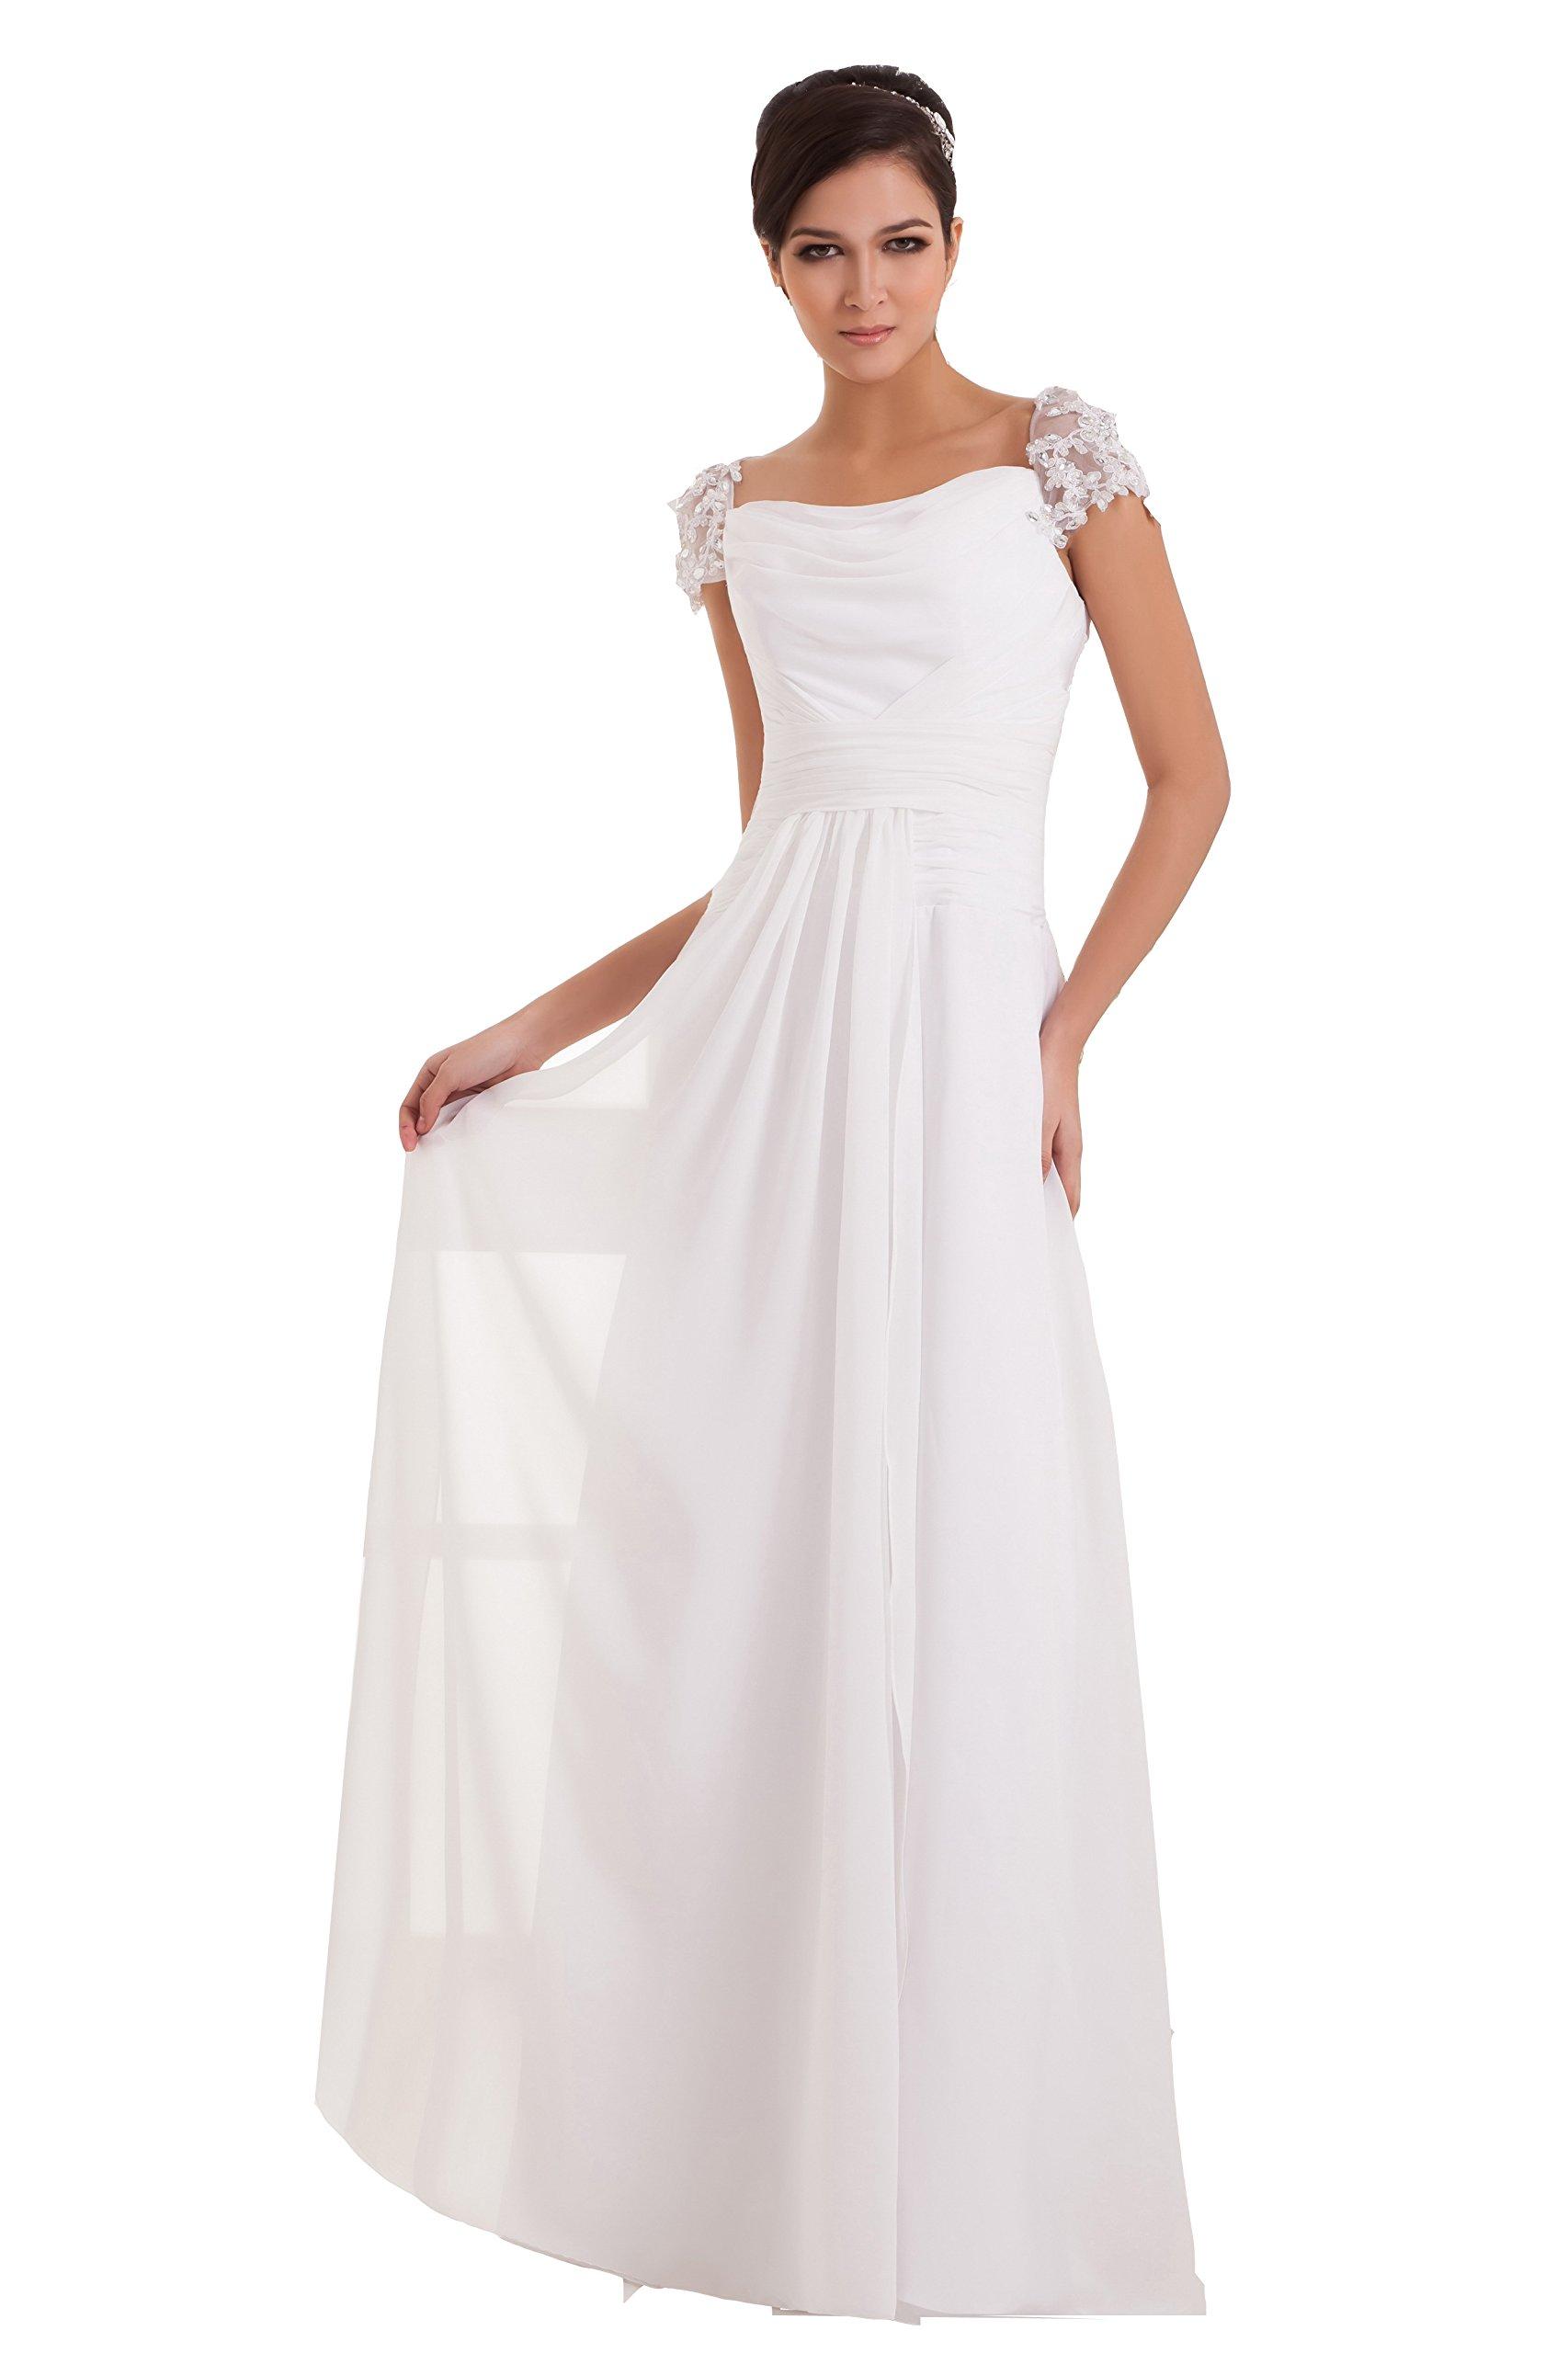 VogueZone009 Womens Square Neck Short Sleeve Pongee Chiffon Soft Mesh Dress, ColorCards, 18W by VogueZone009